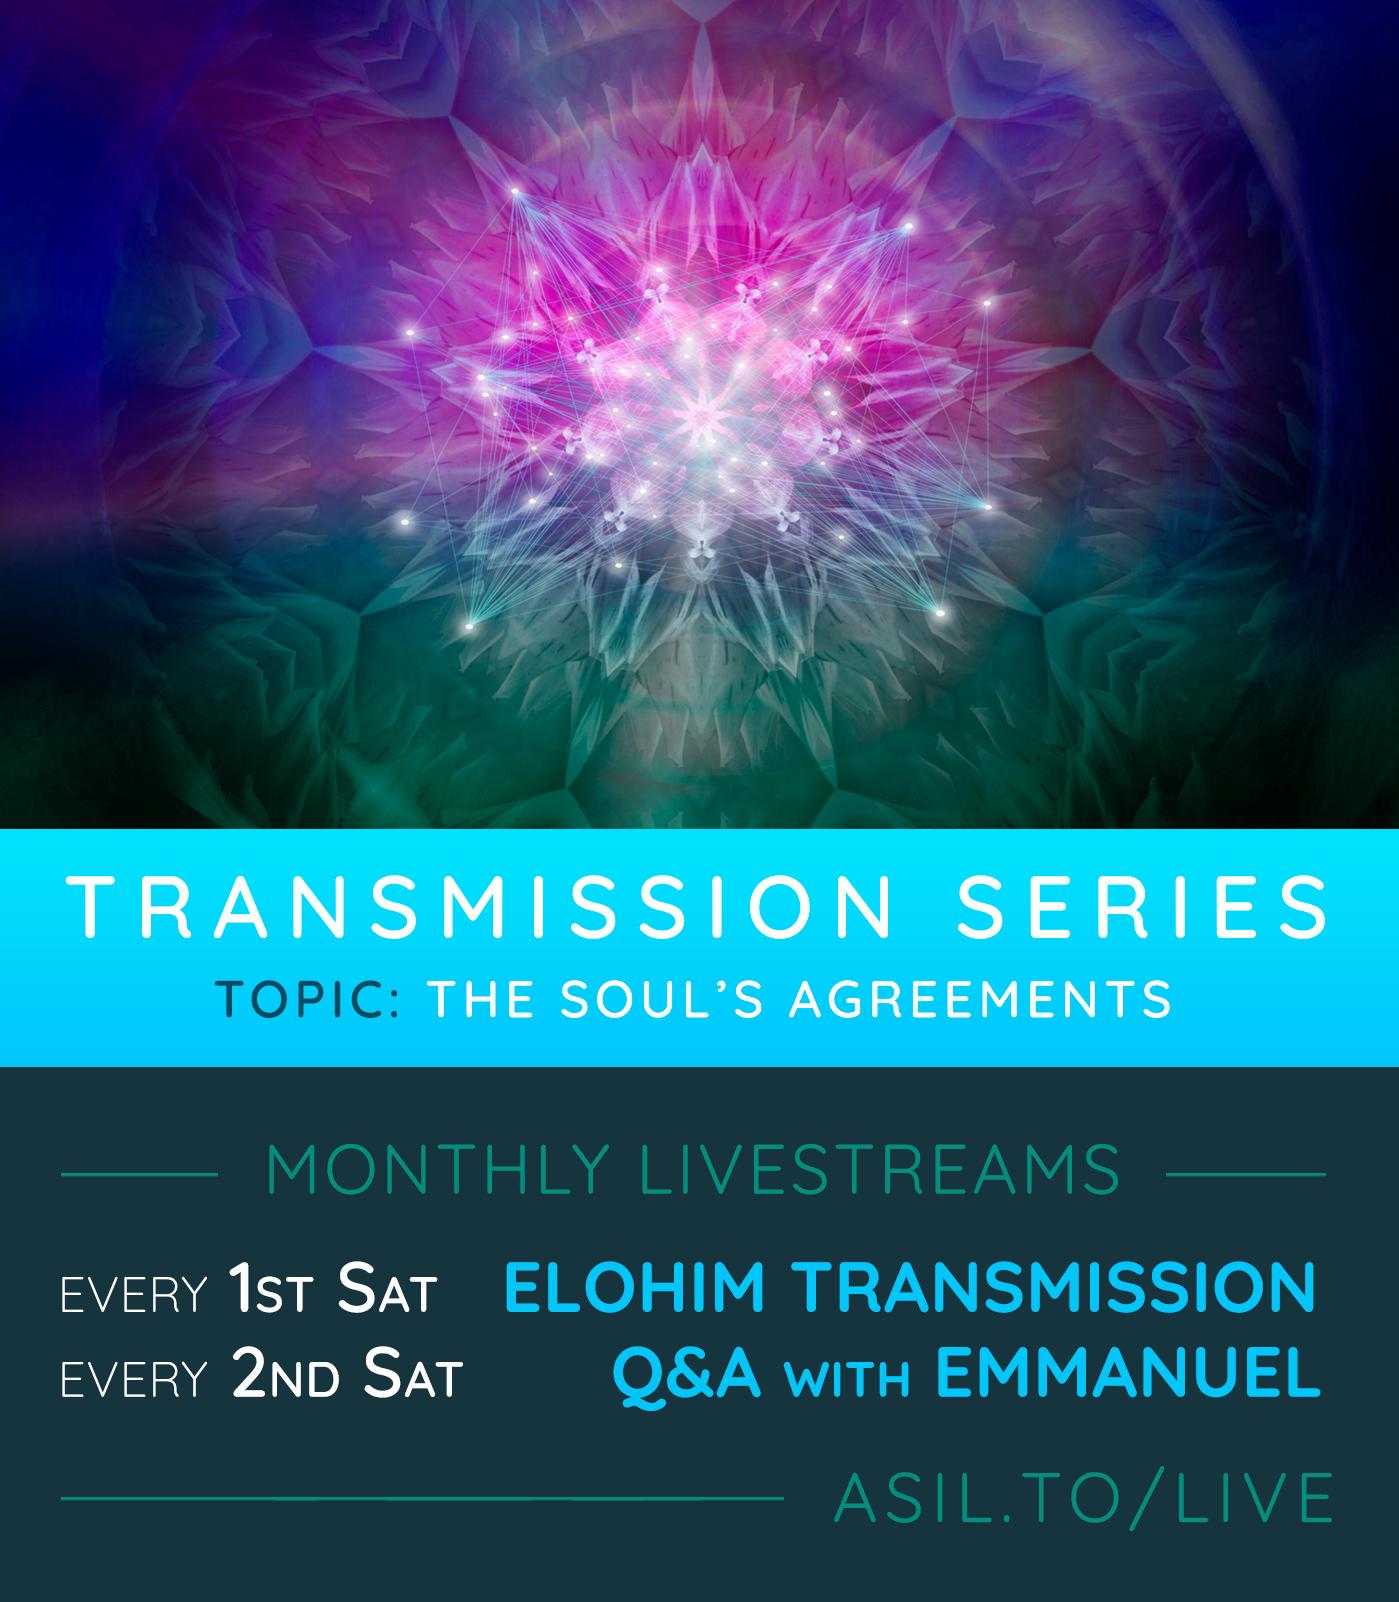 Transmission Series